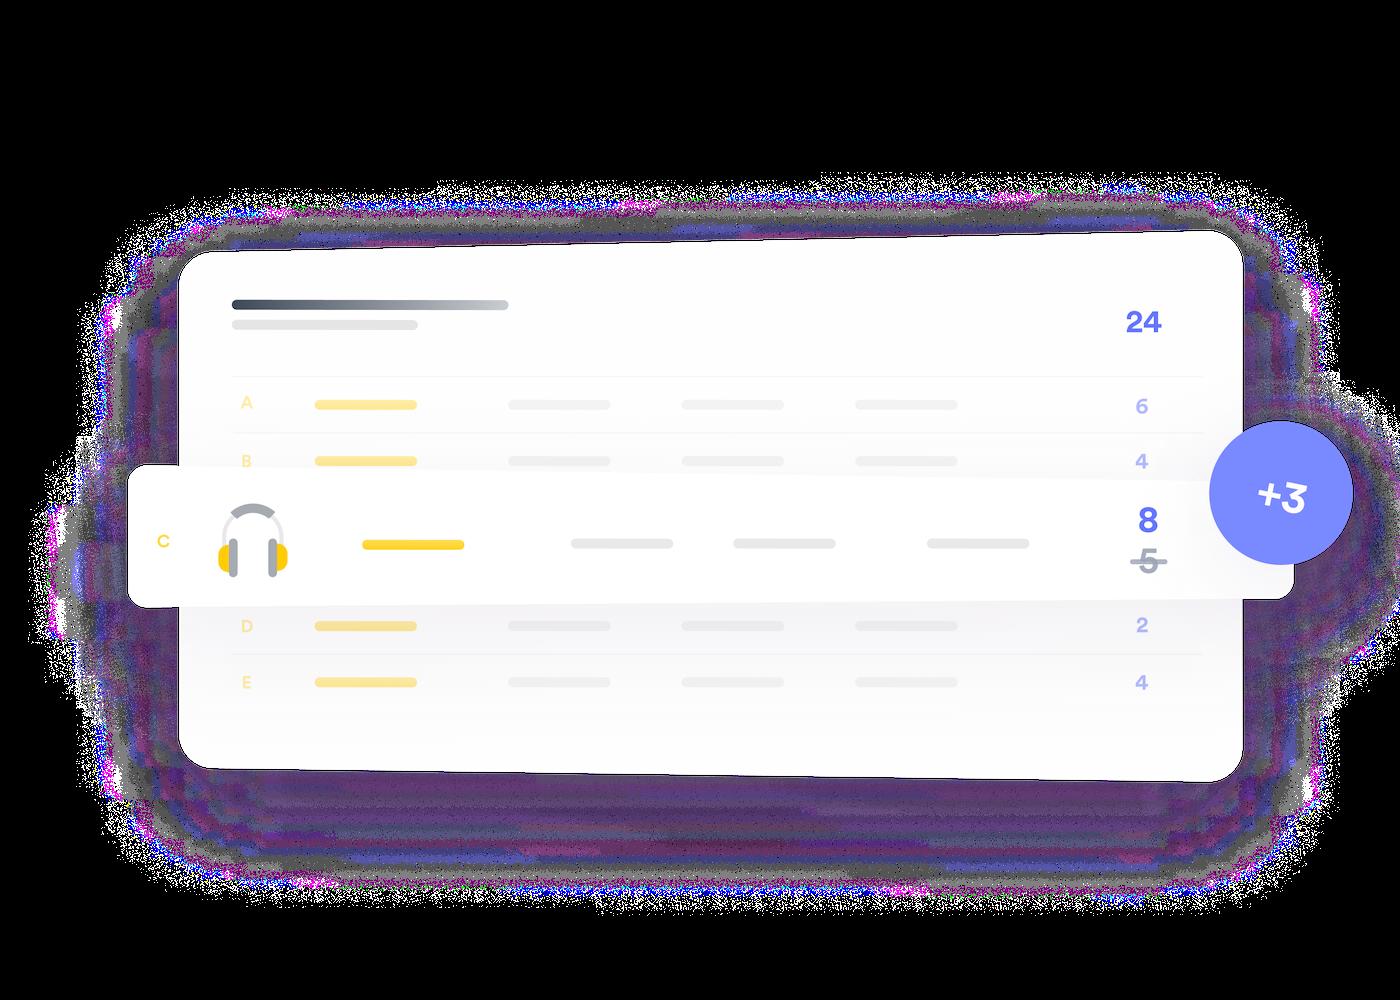 Illustration of e-commerce inventory management